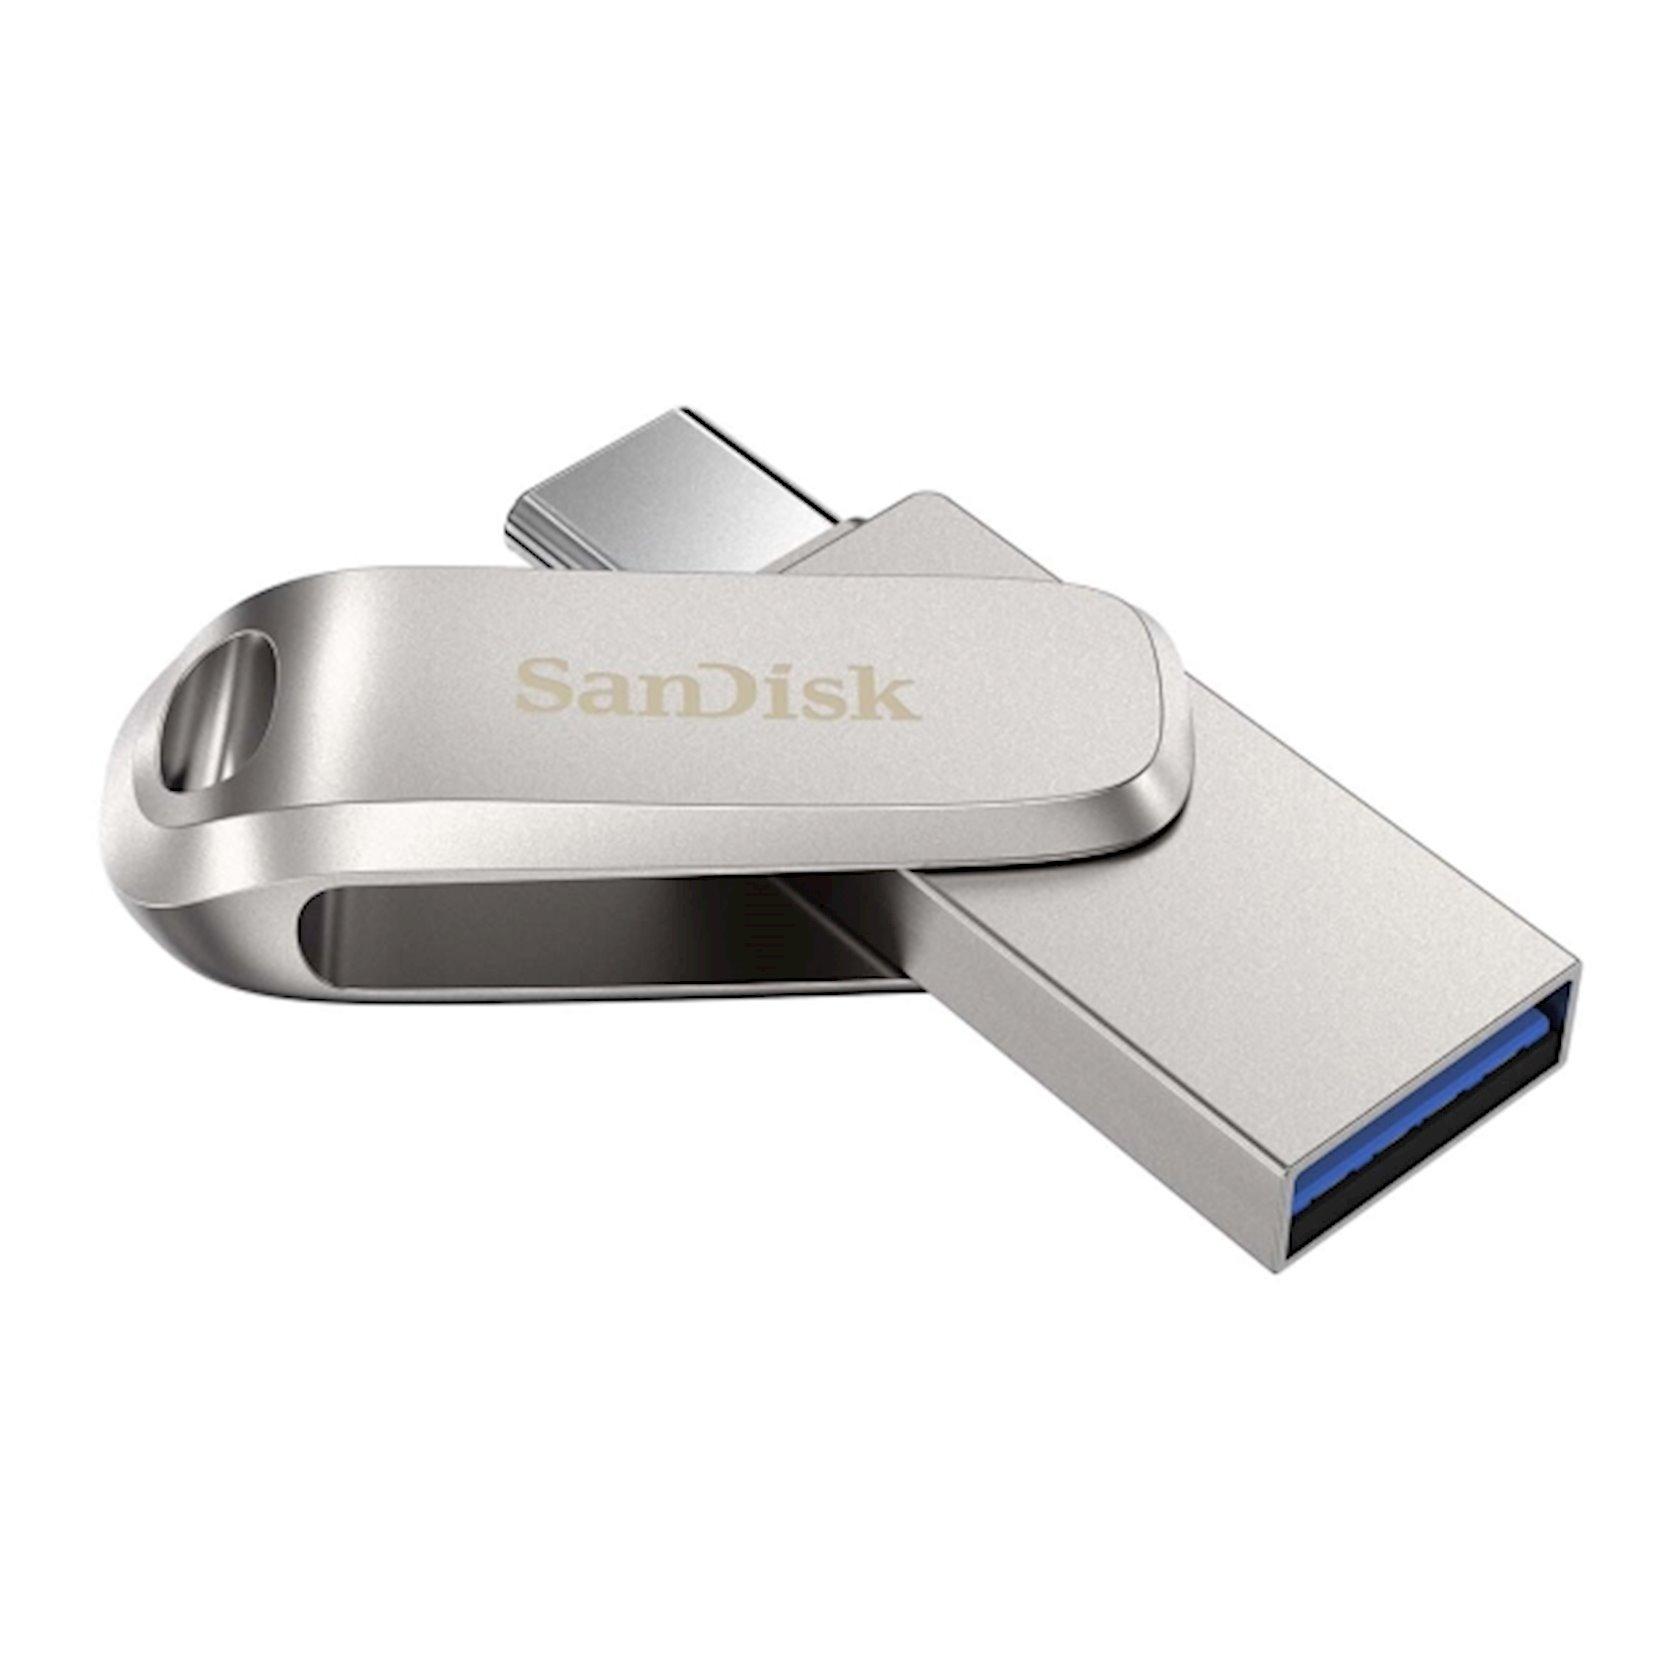 Fleş kart SanDisk 32GB Ultra Dual Drive Luxe